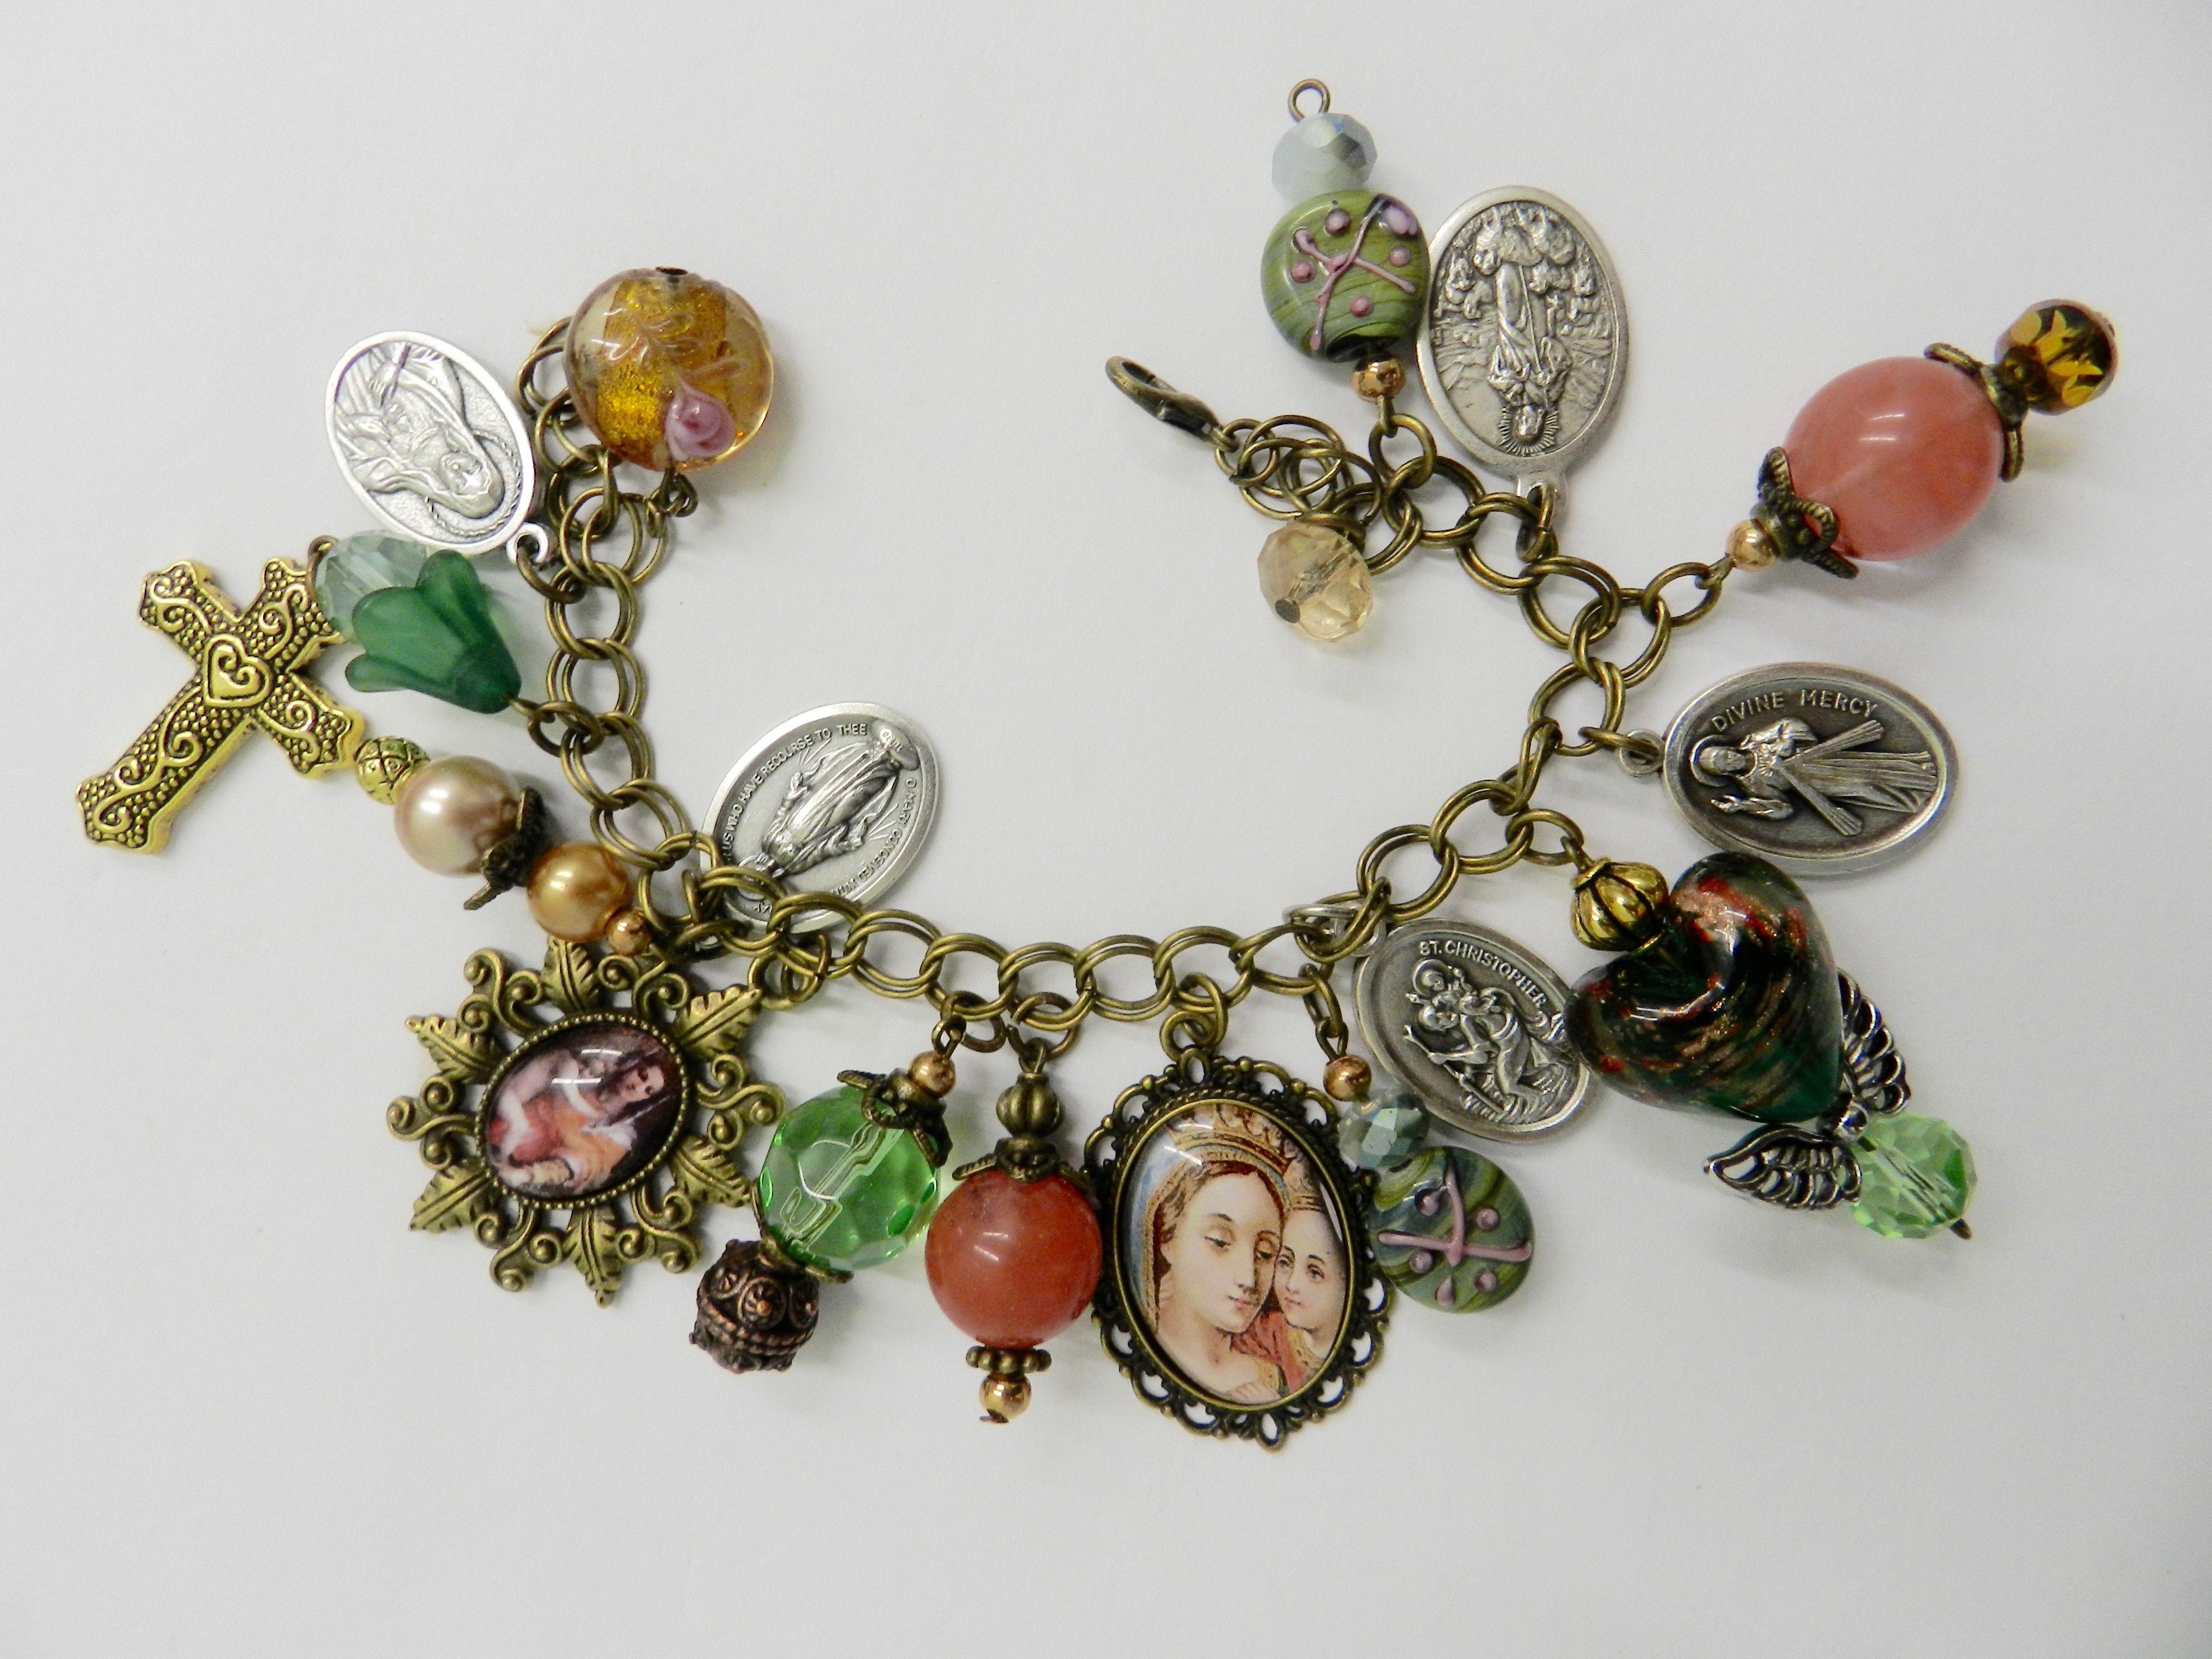 Ornate religious holy medal catholic charm bracelet with two framed